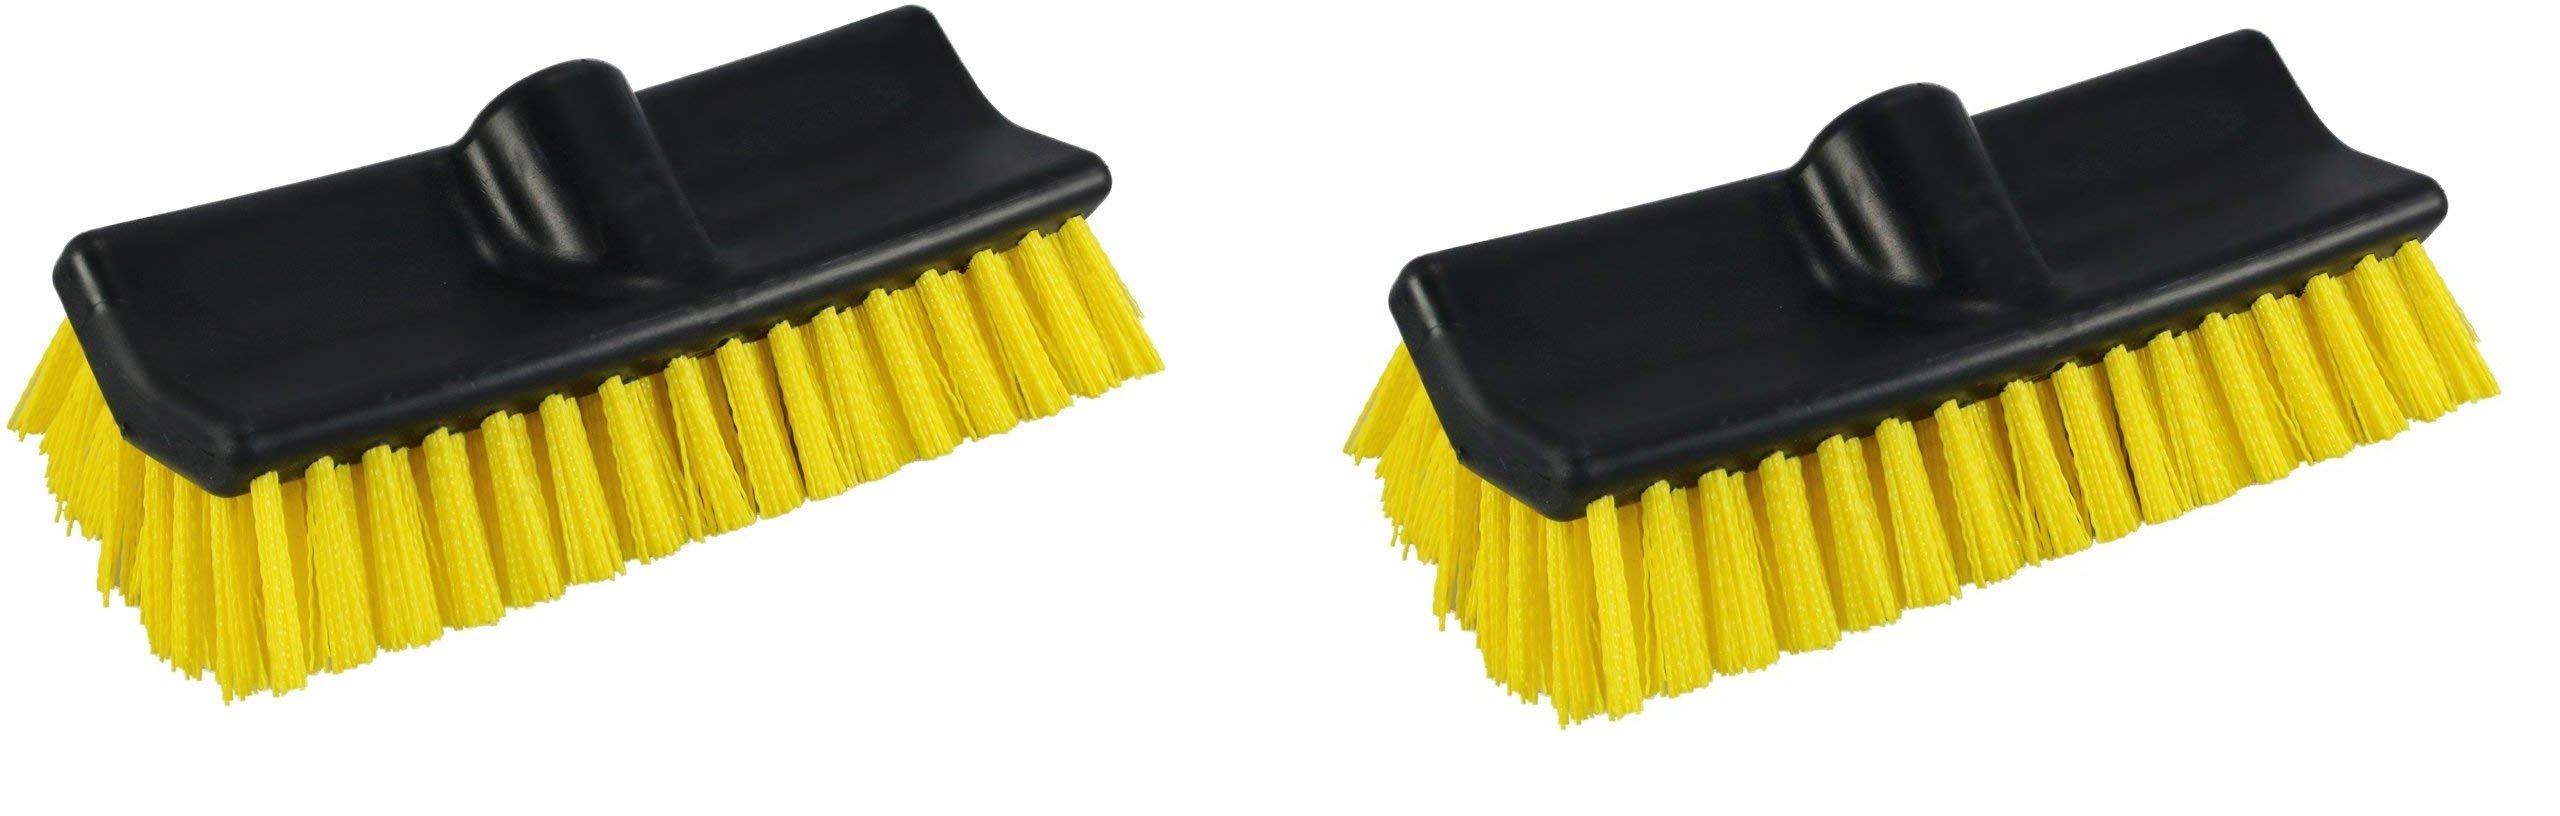 Unger Professional HydroPower Bi-Level Scrub Brush, 10'' (2 pack)